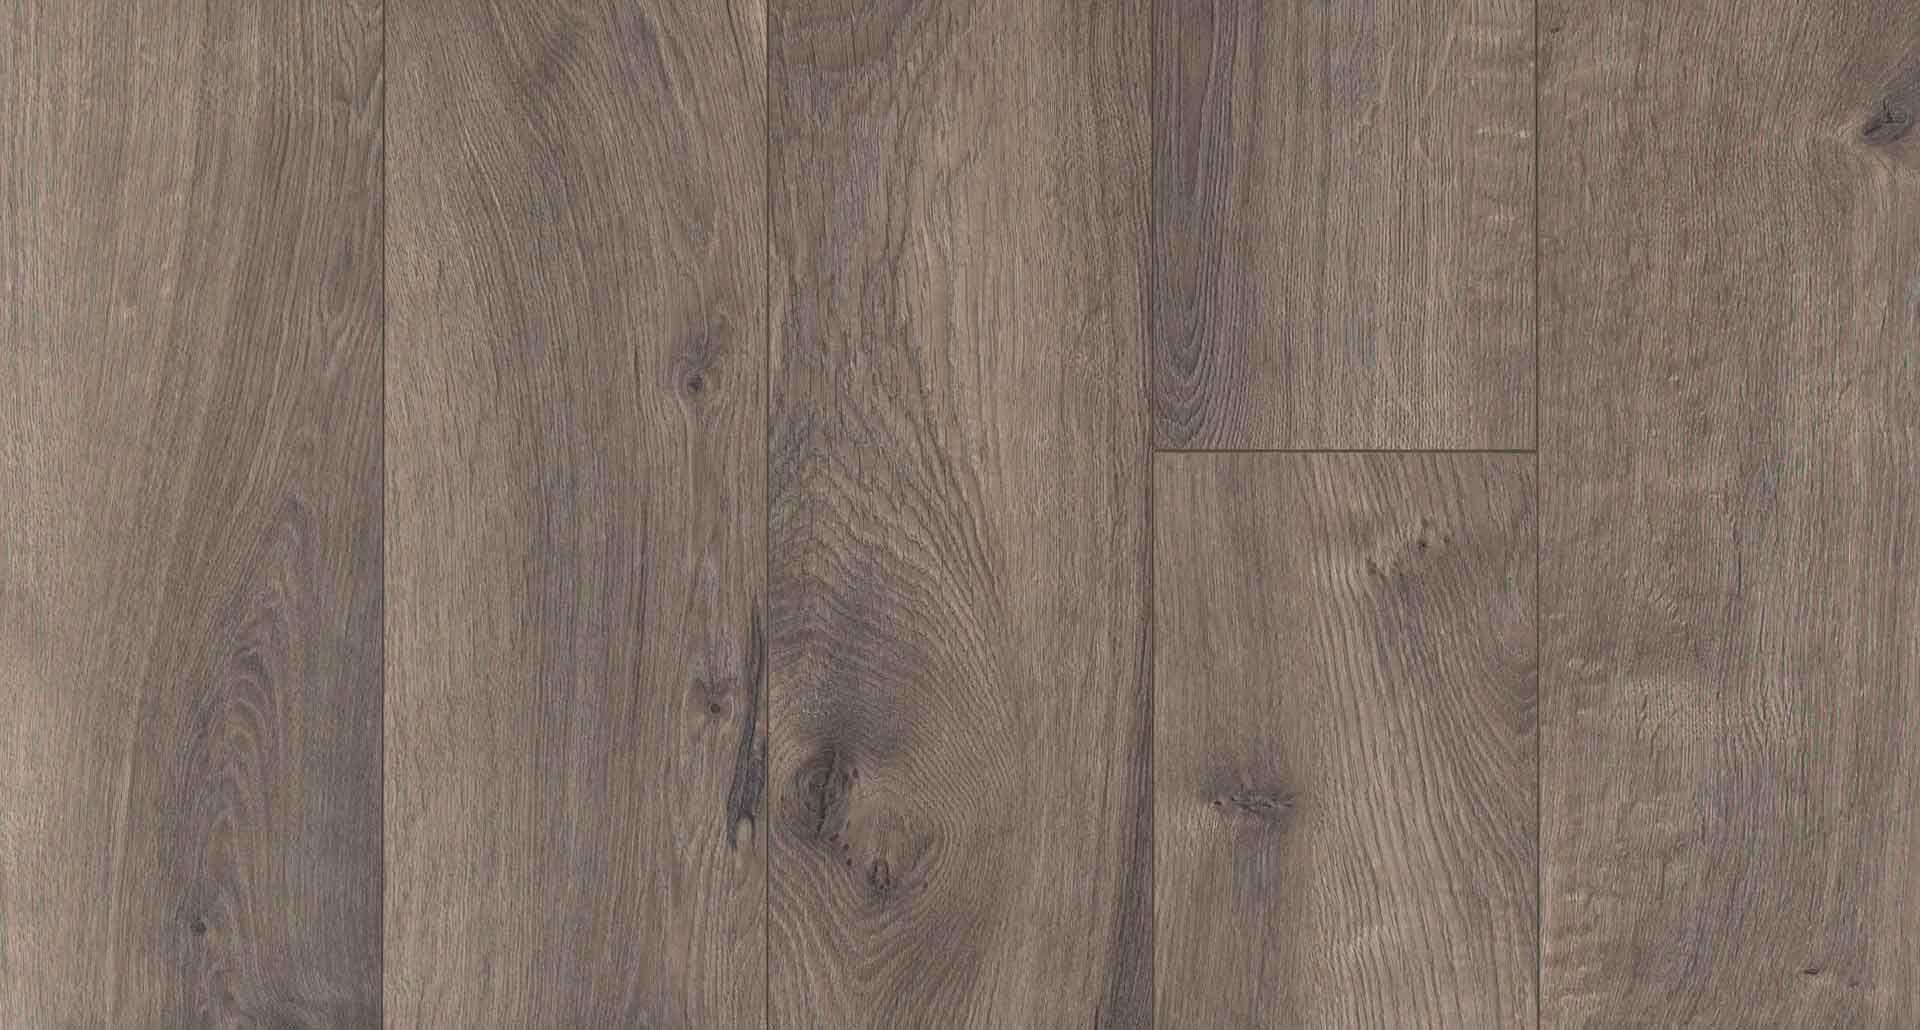 Southern Grey Oak Pergo Xp Laminate Flooring Pergo Flooring Pergo Flooring Warm Gray Flooring Grey Wood Floors